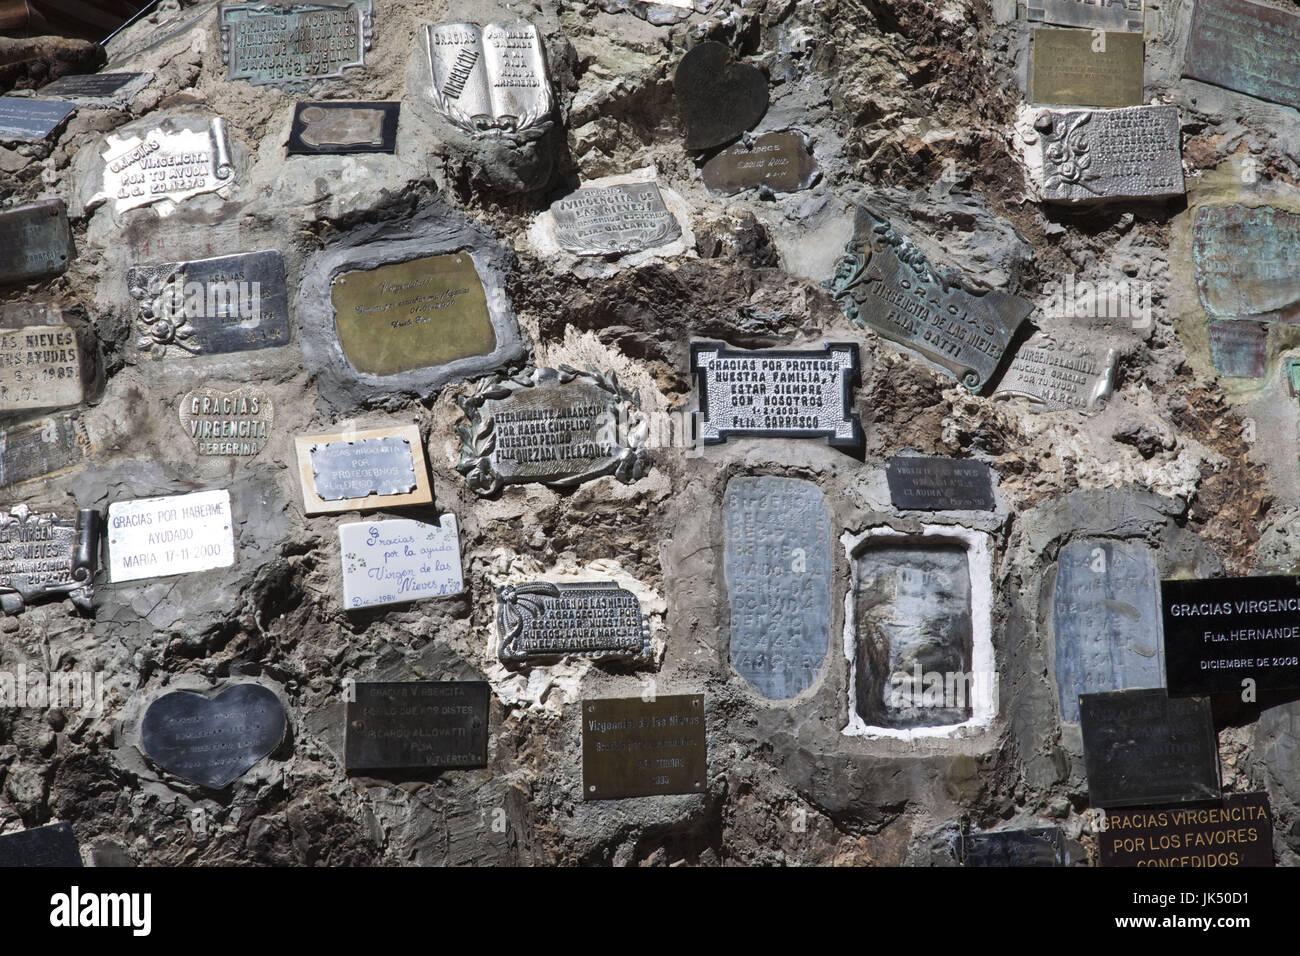 Argentina, Rio Negro Province, Lake District, San Carlos de Bariloche, Virgin of the Snows shrine - Stock Image